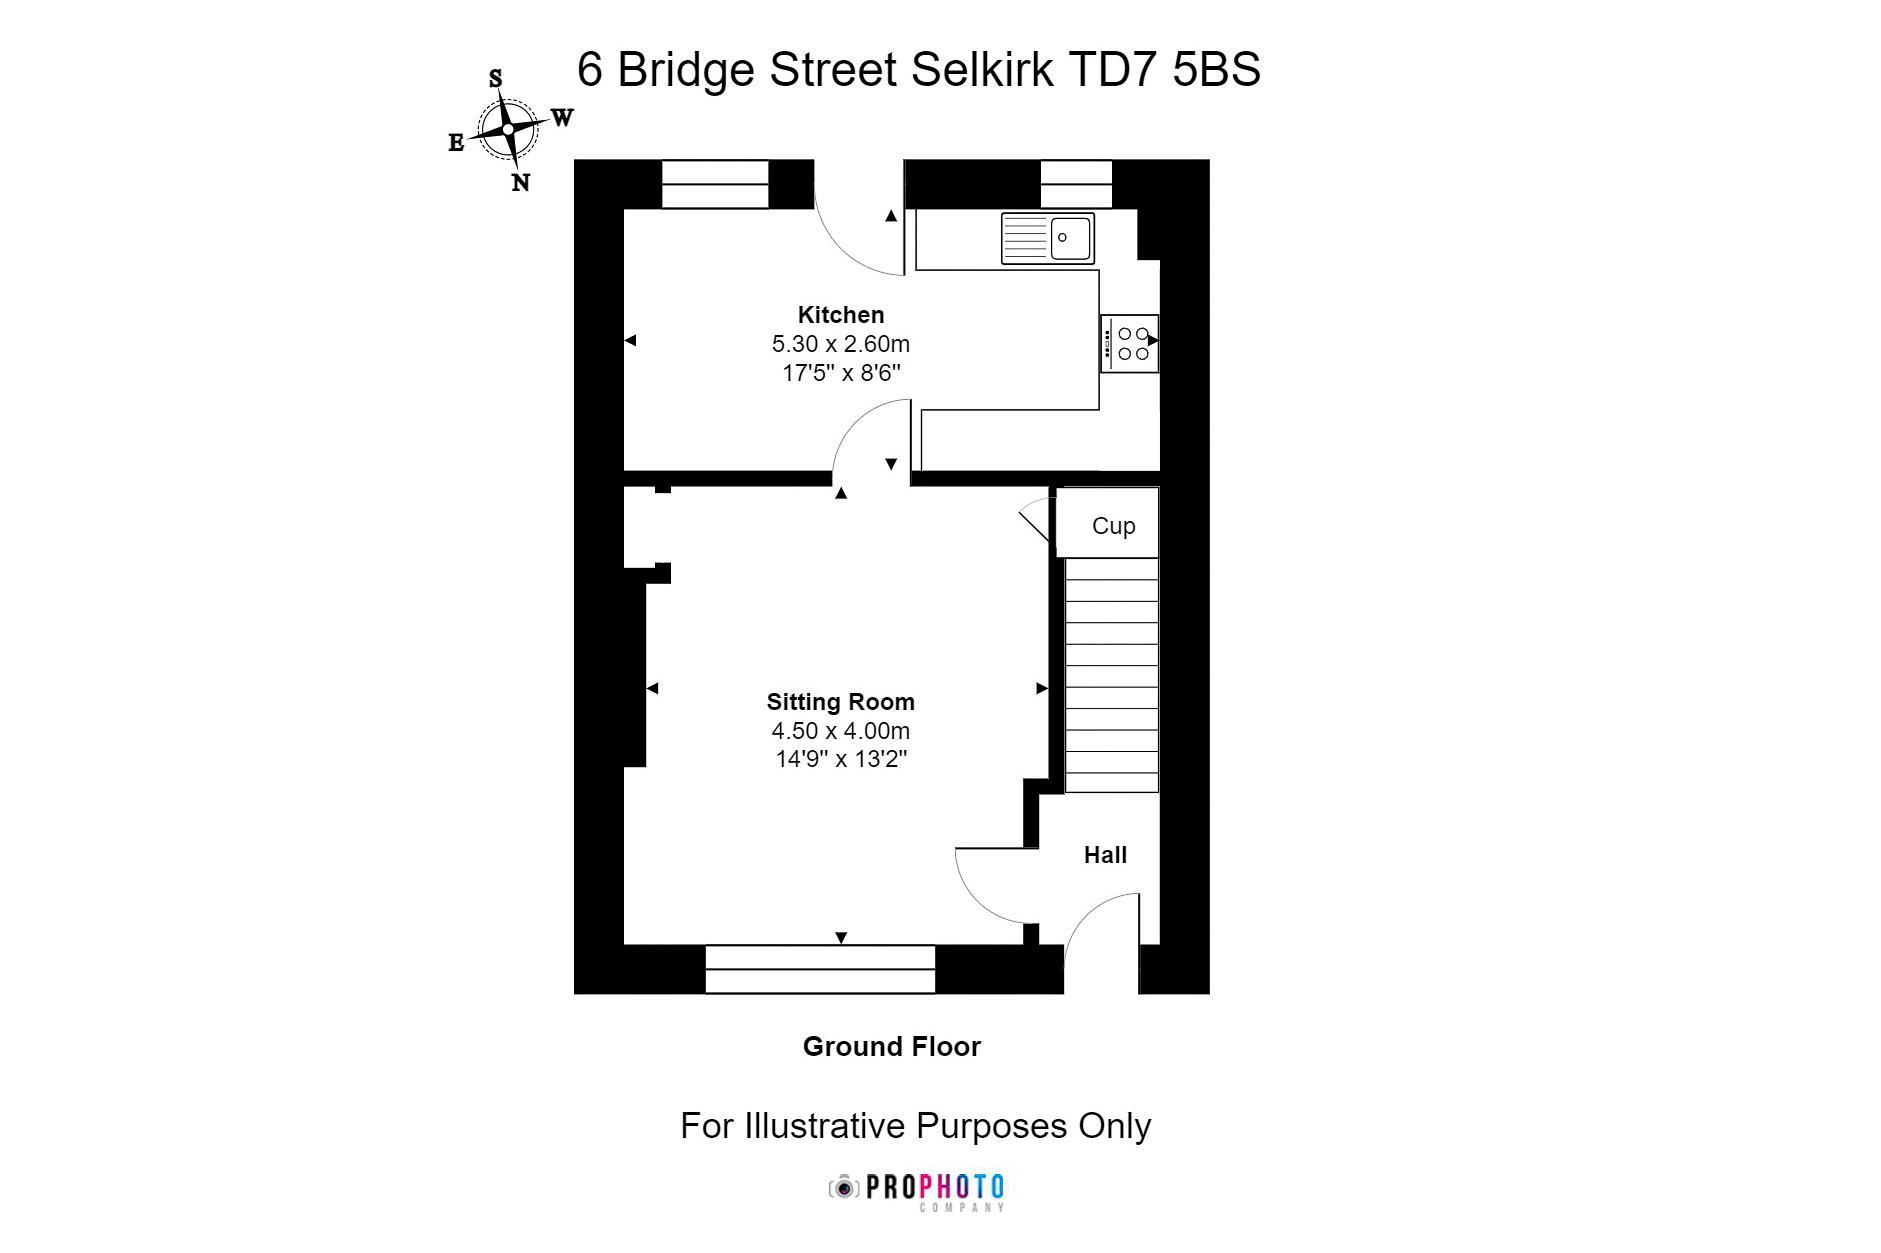 6 Bridge Street Ground Floor